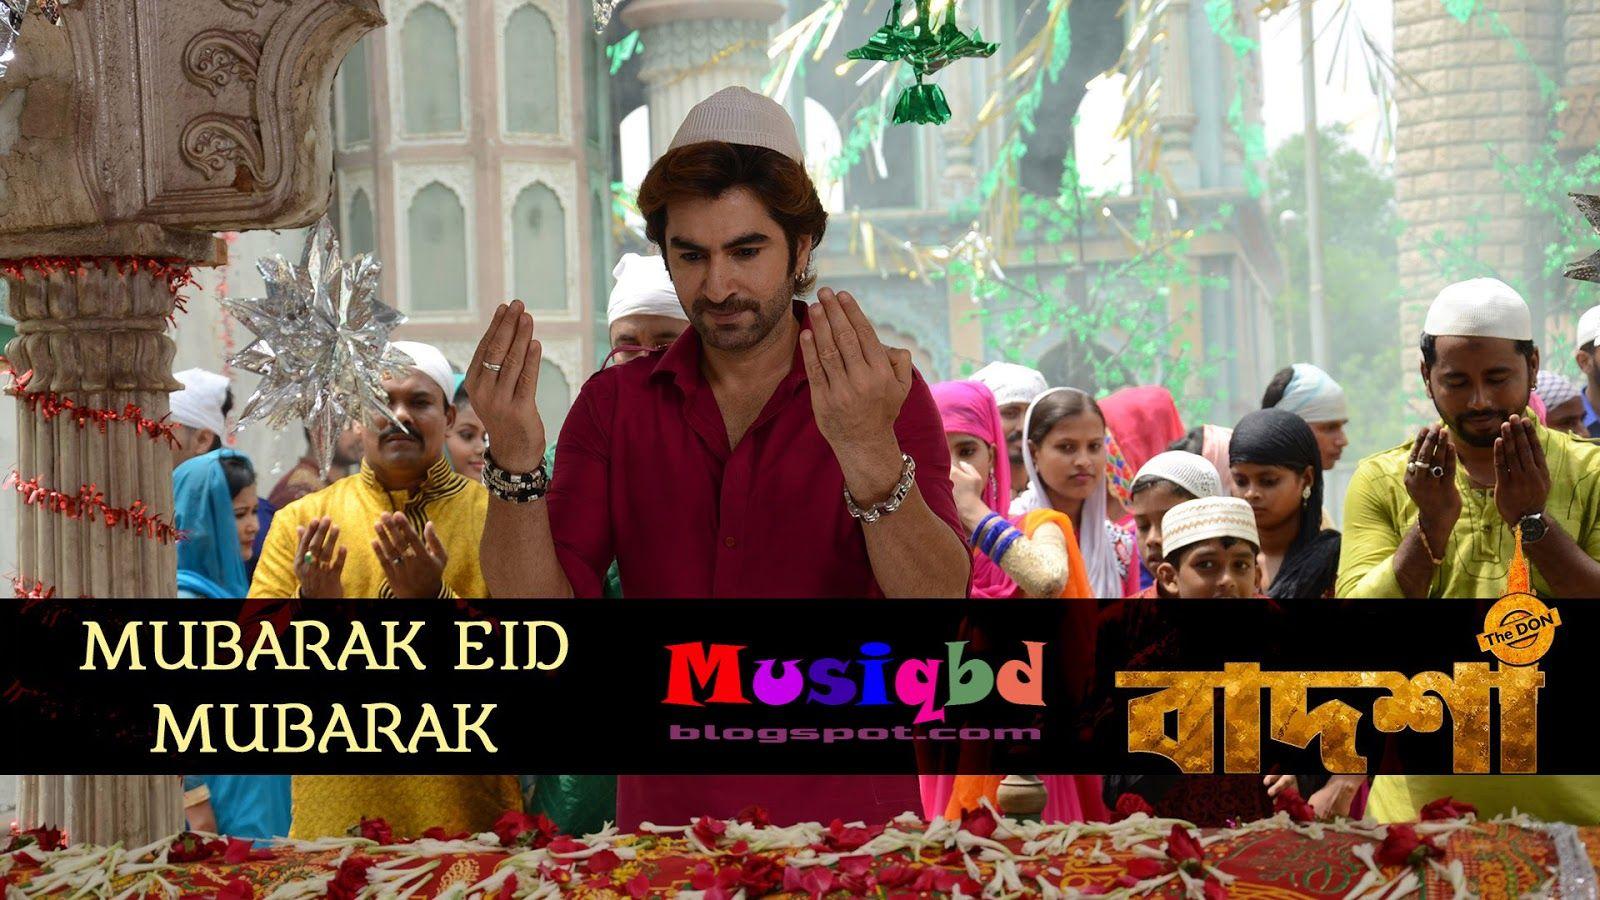 Mubarak Eid Mubarak By Akassh Badshah The Don 2016 Bangali Movie Mp3 Song Download Mp3 Song Download Mp3 Song Eid Mubarak